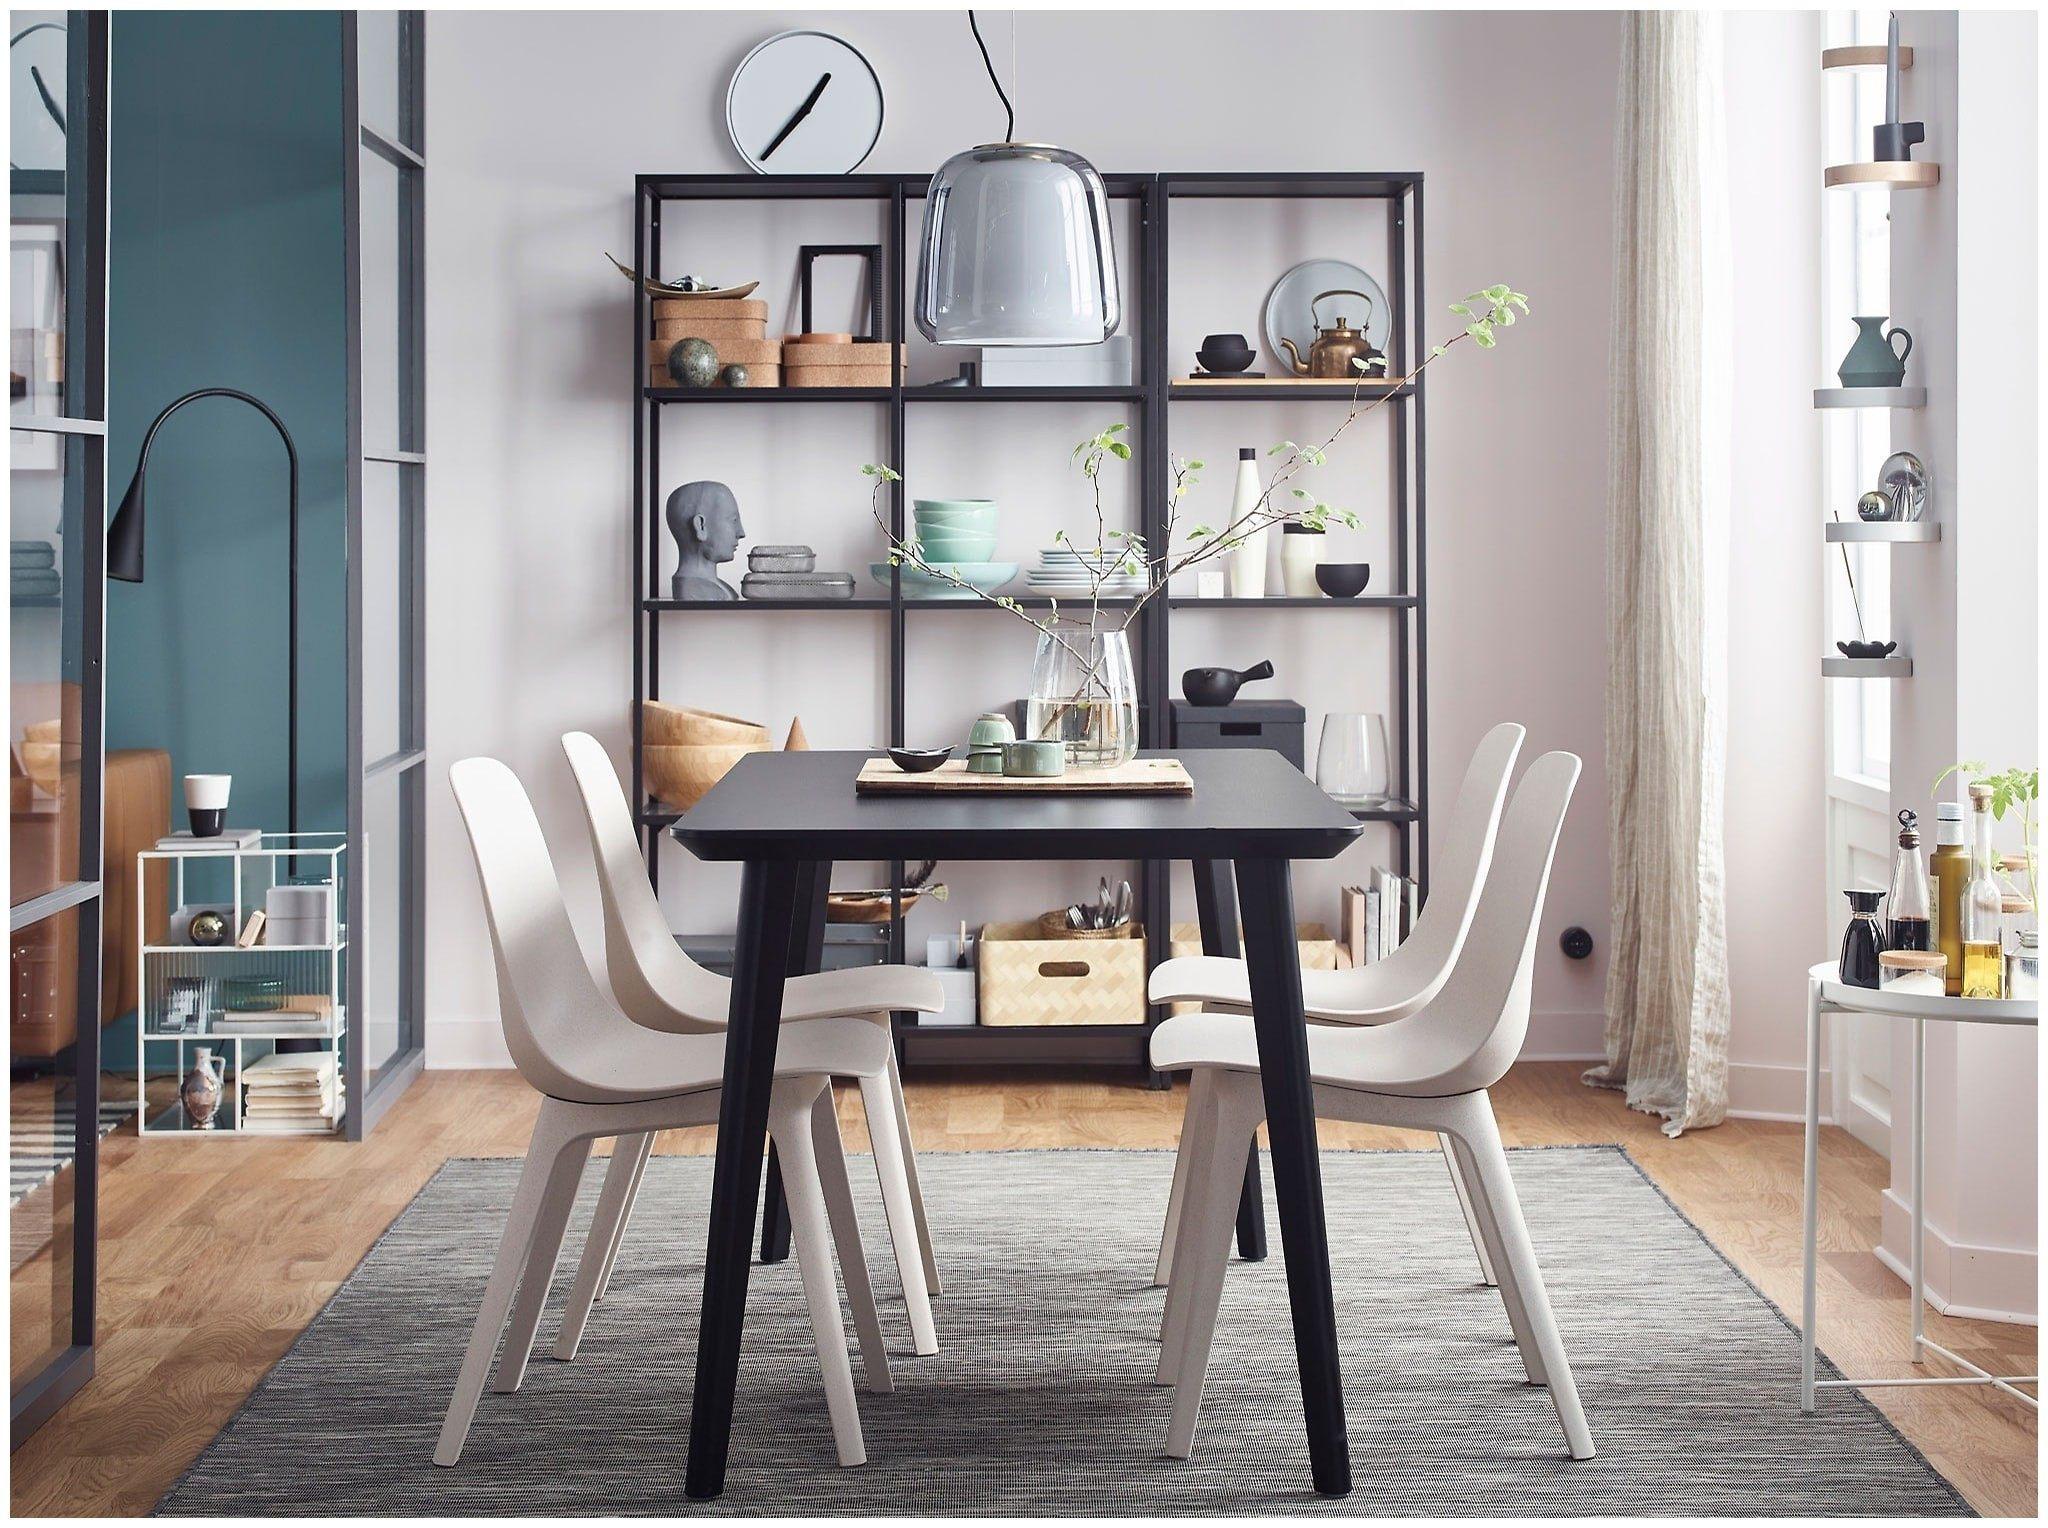 Descente De Lit Ikea Fraîche Impressionnant Luxe Table De Réunion Ikea